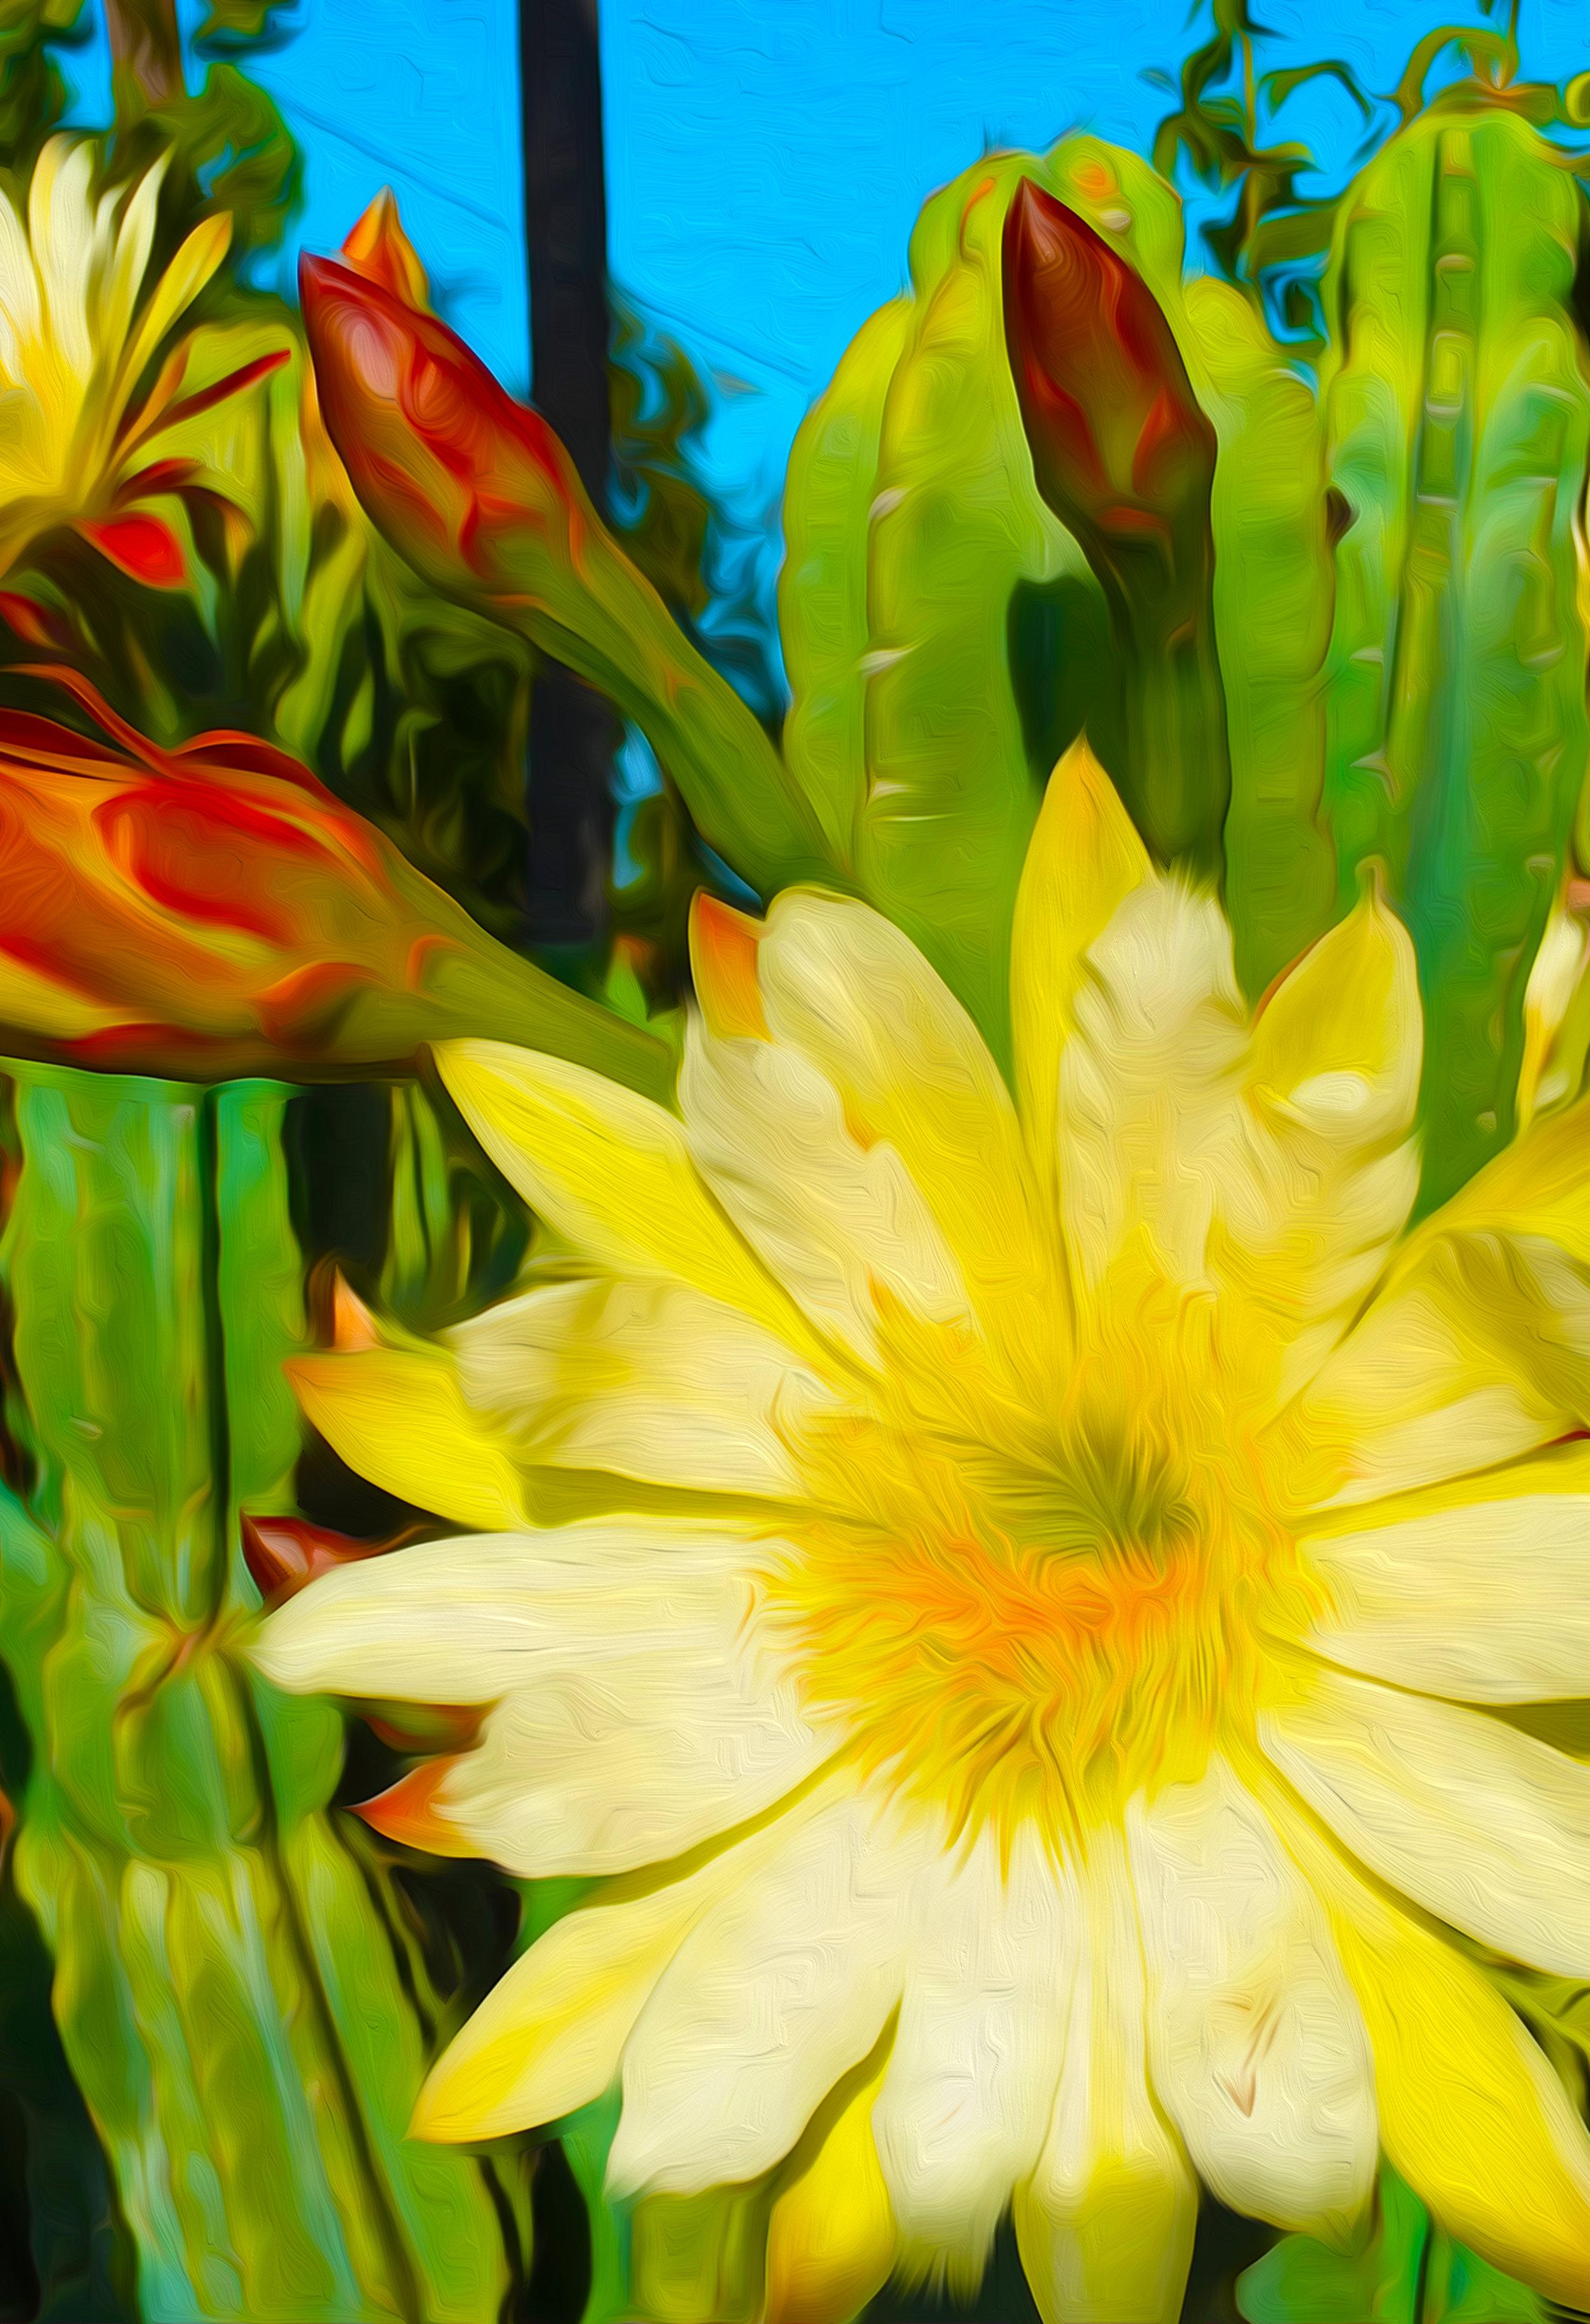 Cactus Blossum 1 jpg